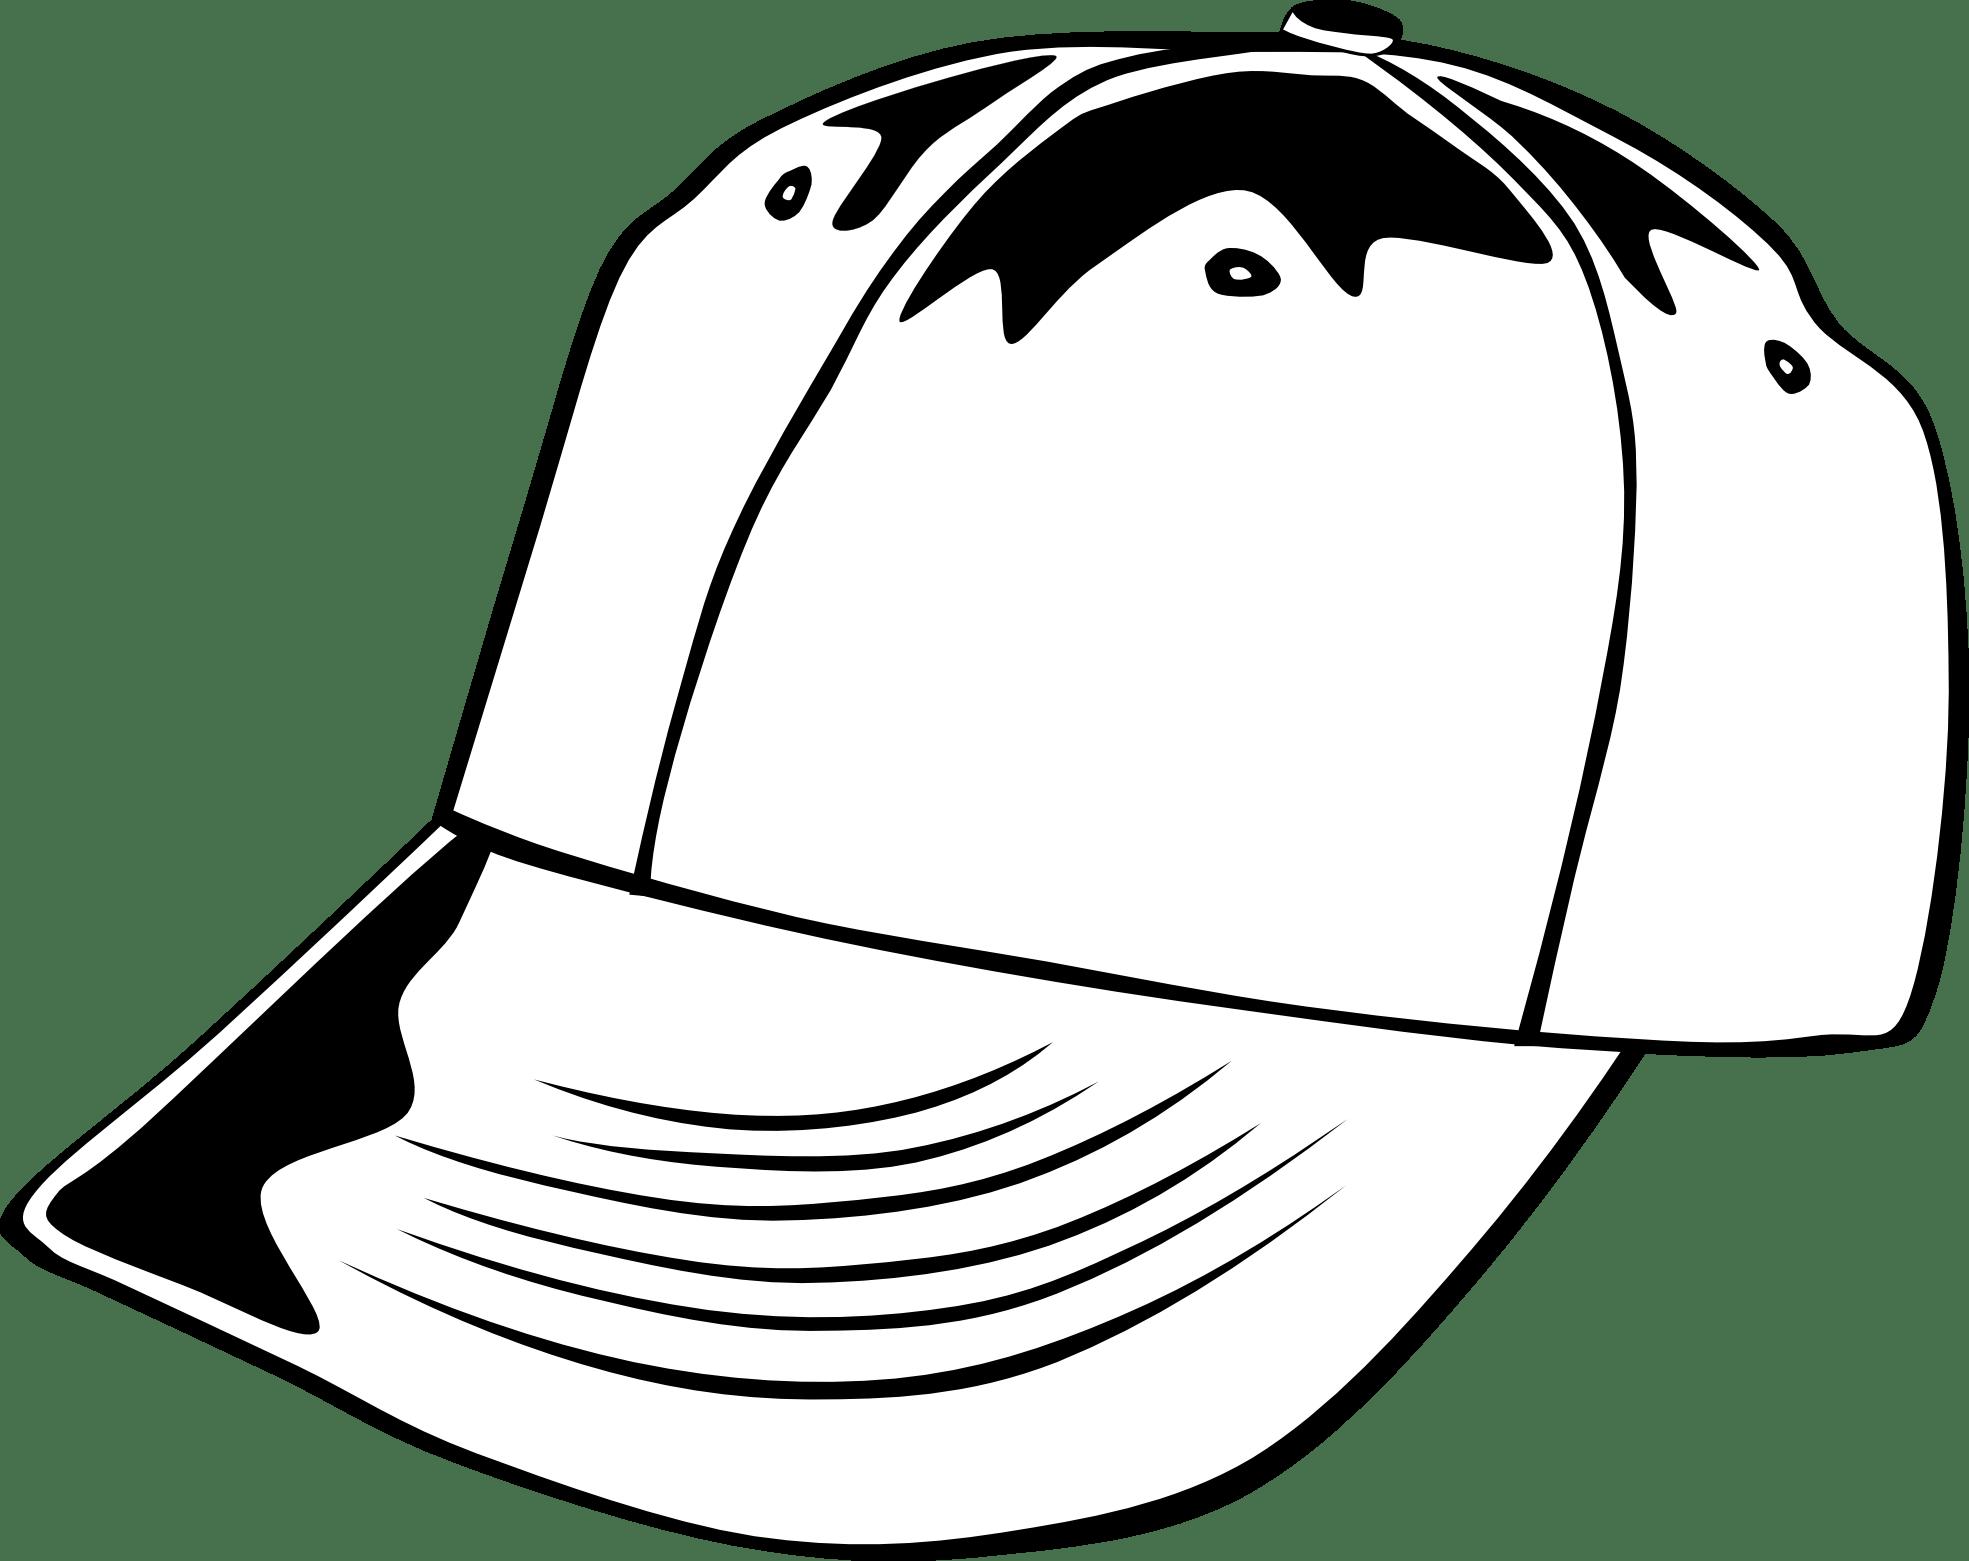 Baseball hat front facing clipart transparent stock Baseball Hat Template - Costumepartyrun transparent stock